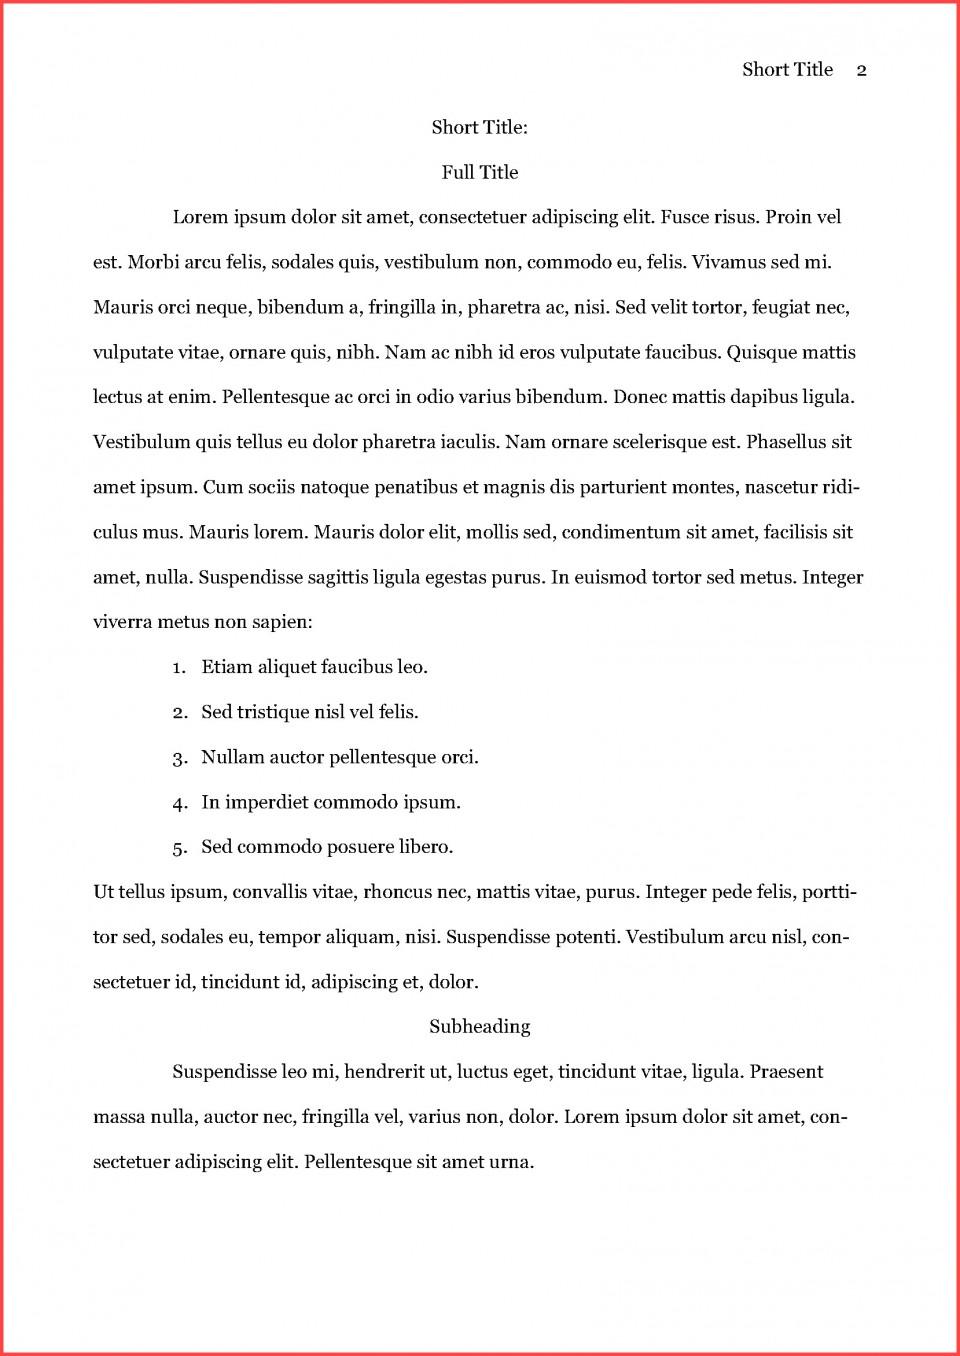 003 Asa Format Example Remarkable Essay Reference Generator Heading Citation 960